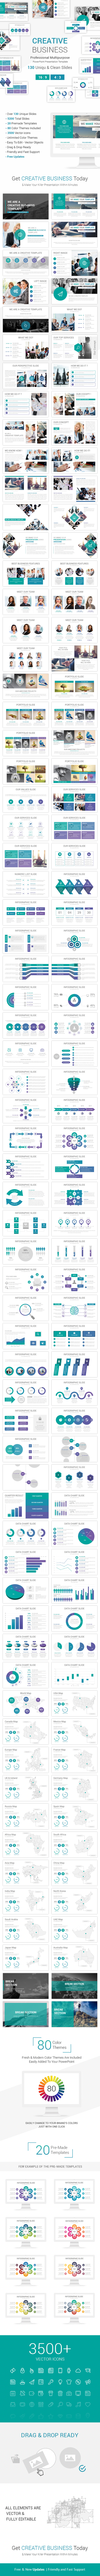 Creative Business PowerPoint Presentation Template - Business PowerPoint Templates